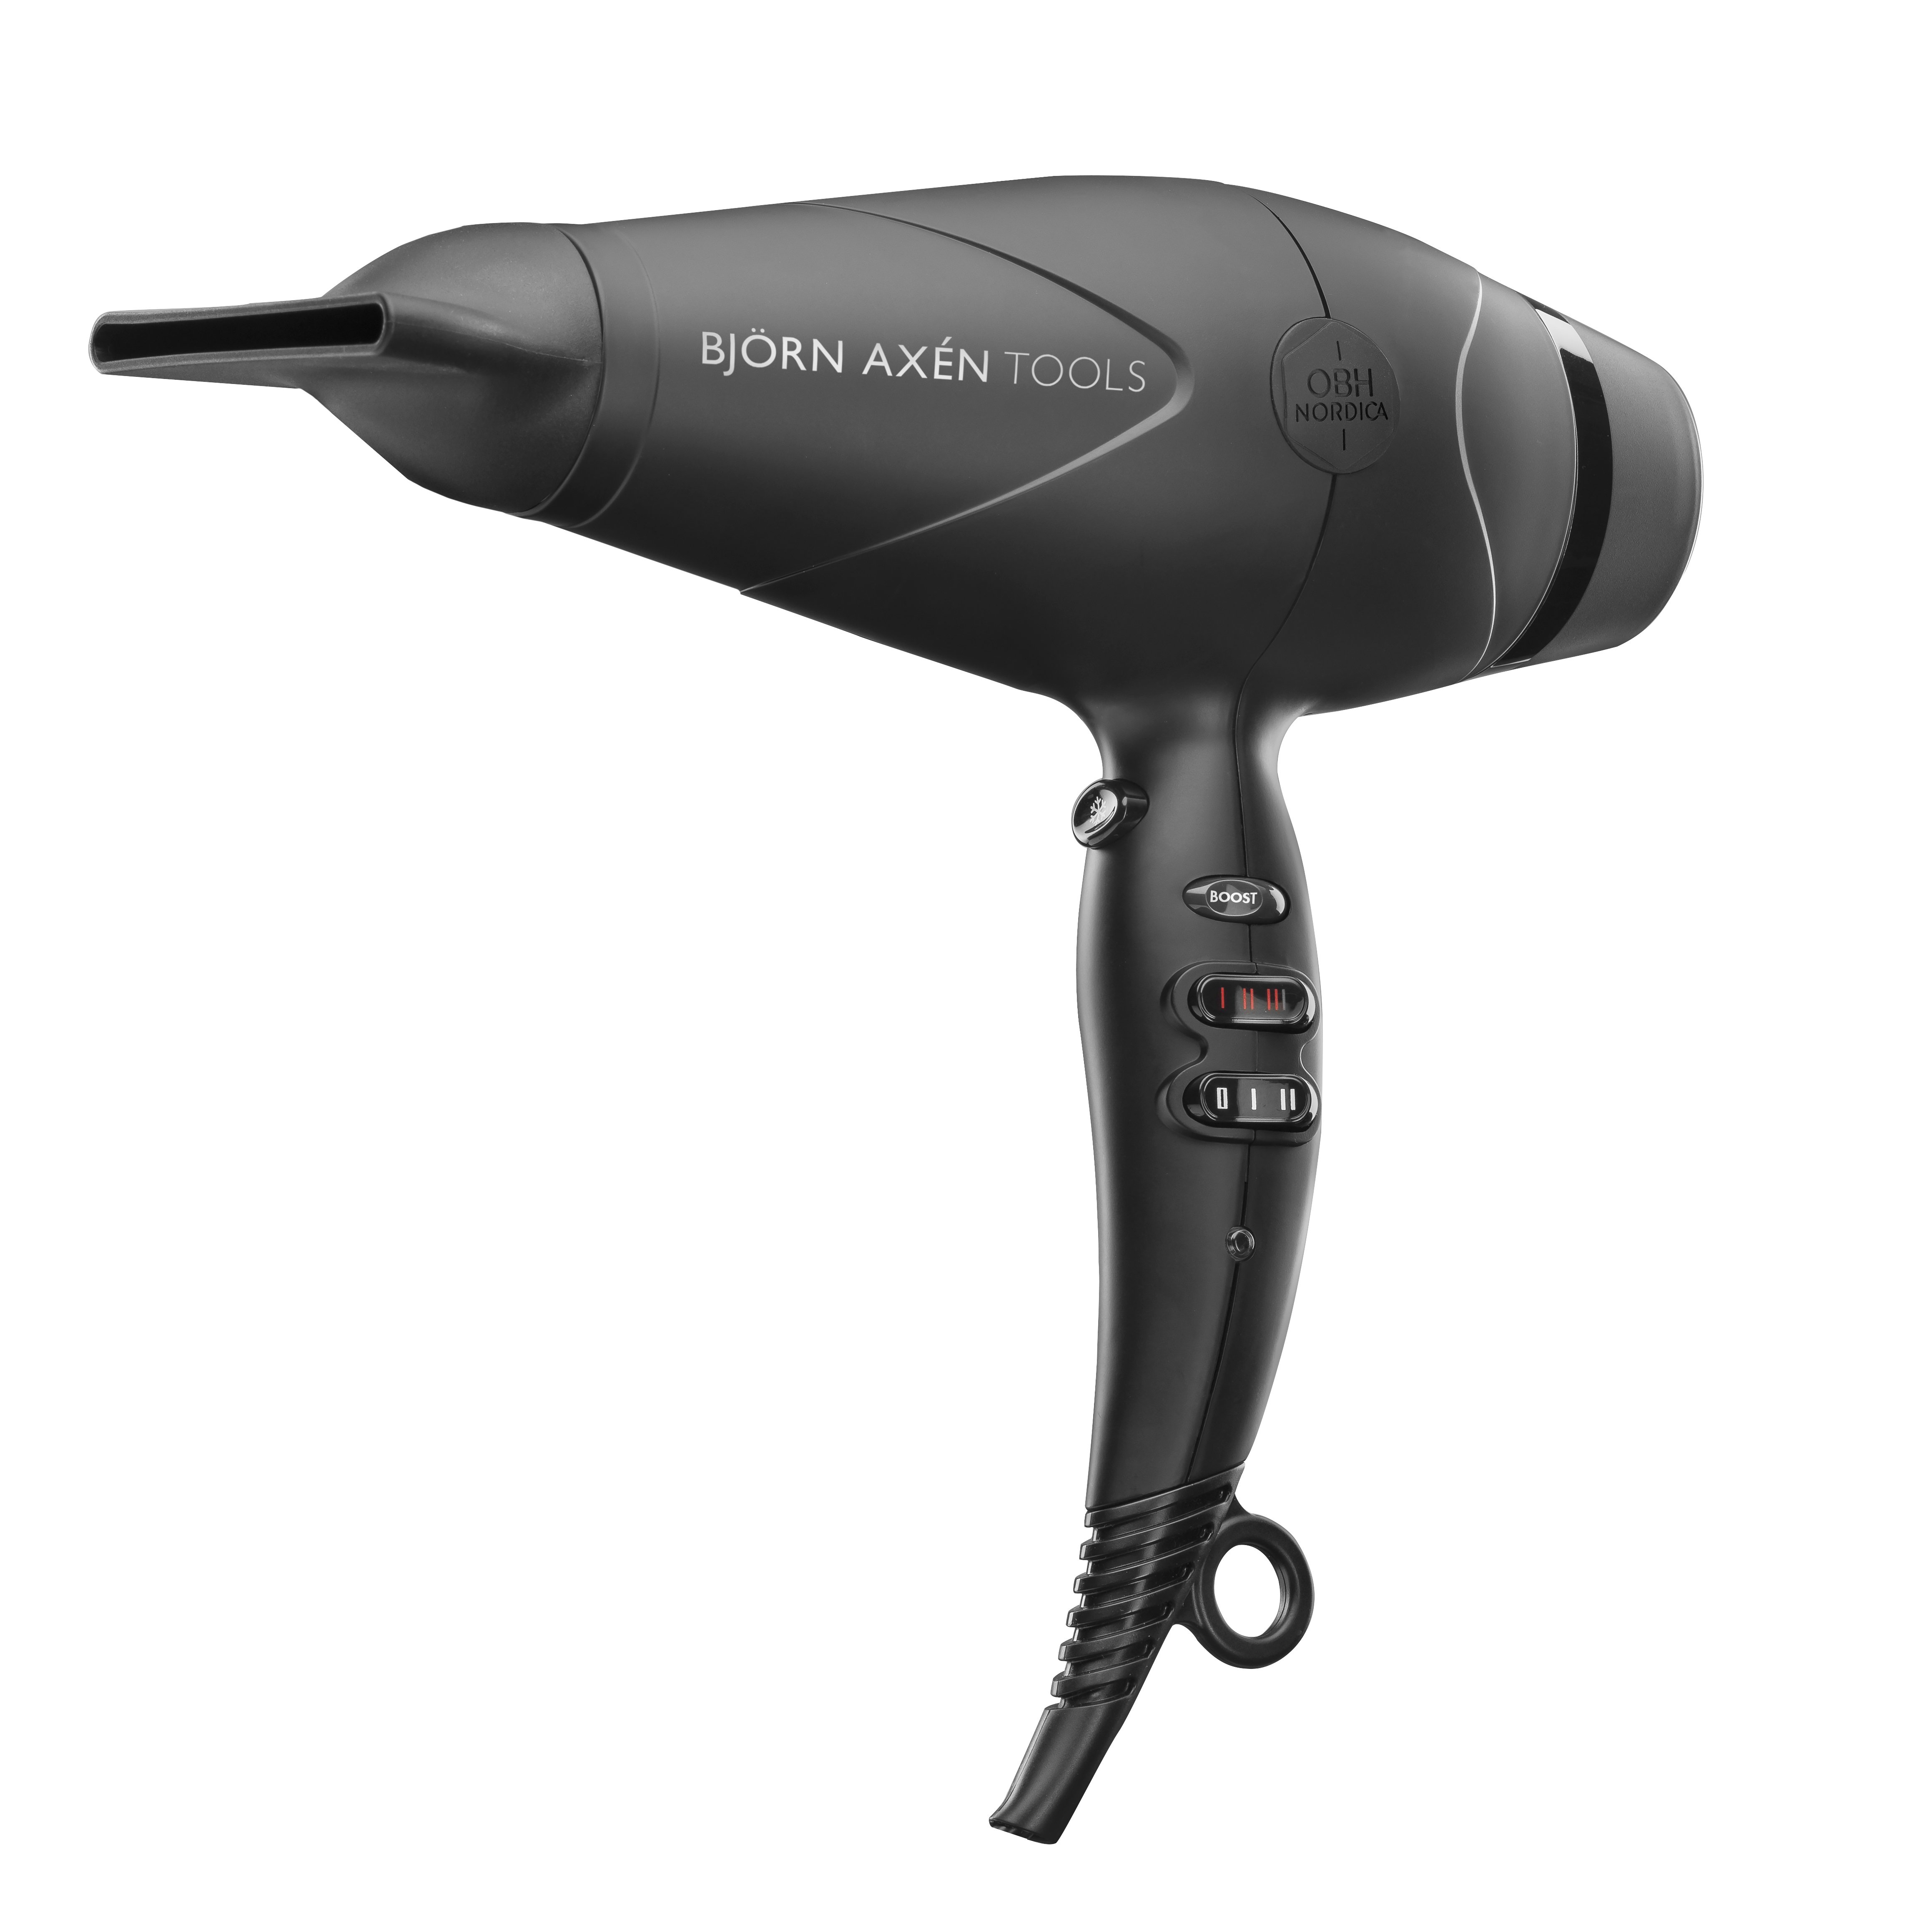 OBH Nordica - Silence Pro Hair Dryer - Black (5163)